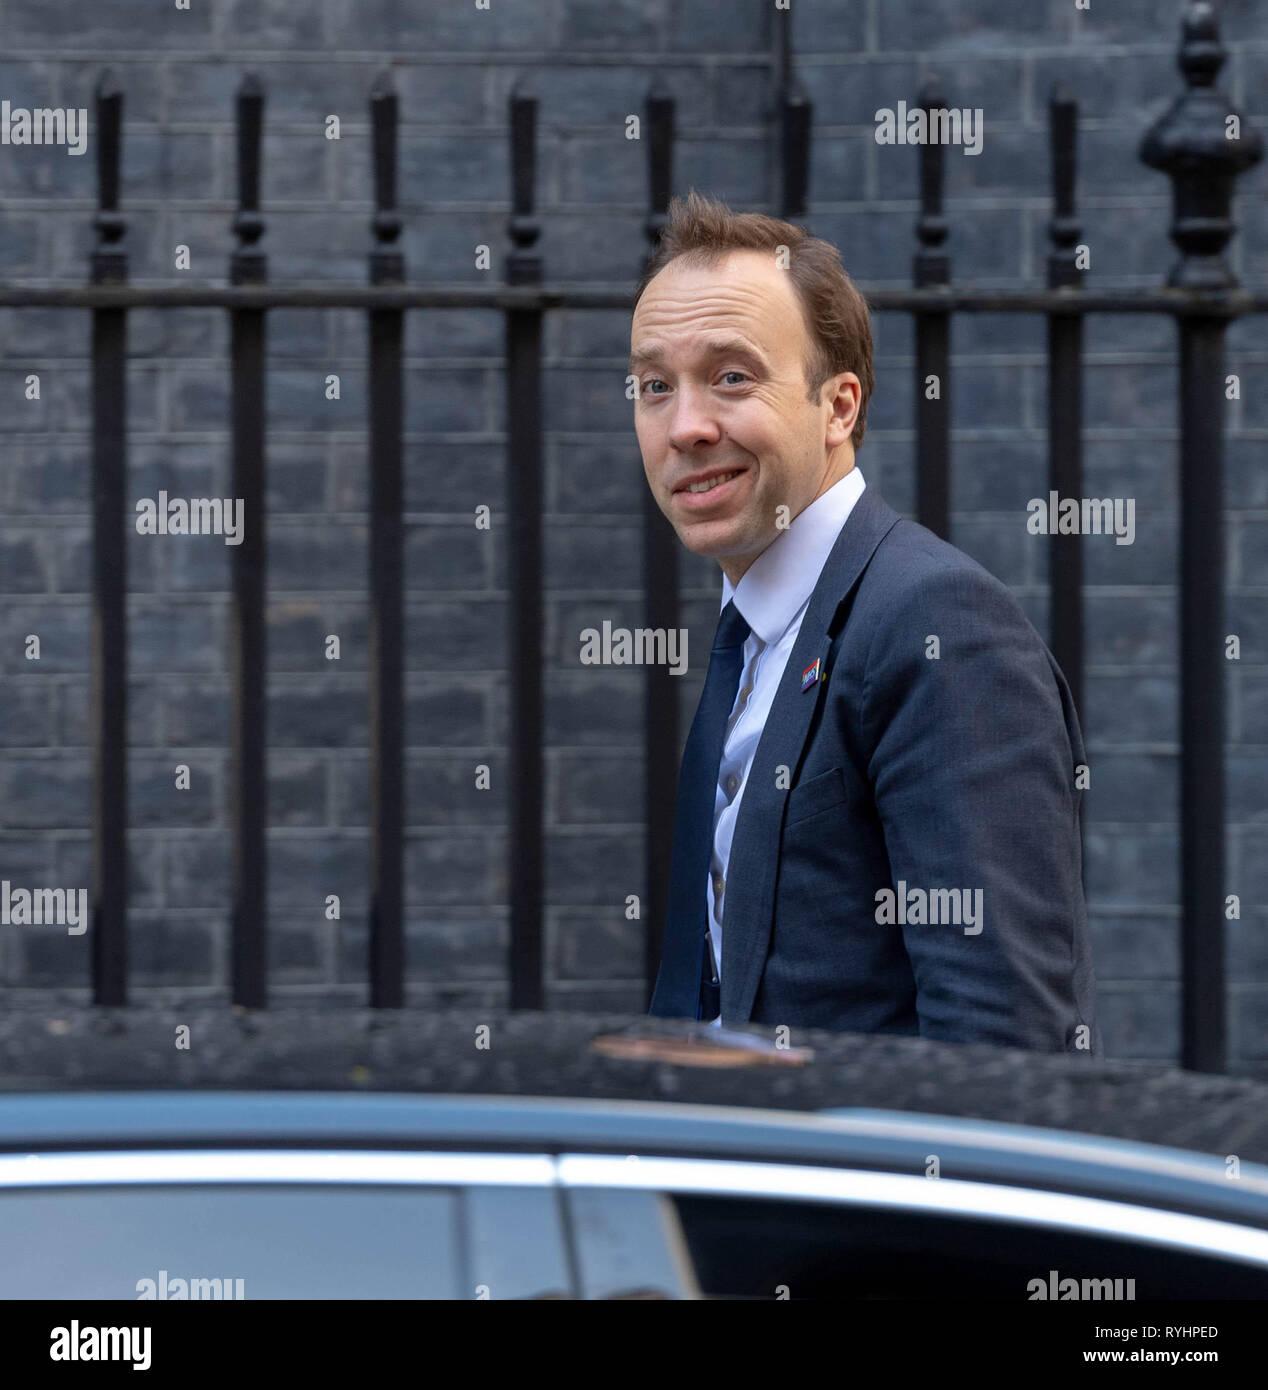 London, UK. 14th Mar 2019. Matt Hancock, MP PC, Health Secretary arrives at a Cabinet meeting at 10 Downing Street, London Credit: Ian Davidson/Alamy Live News - Stock Image